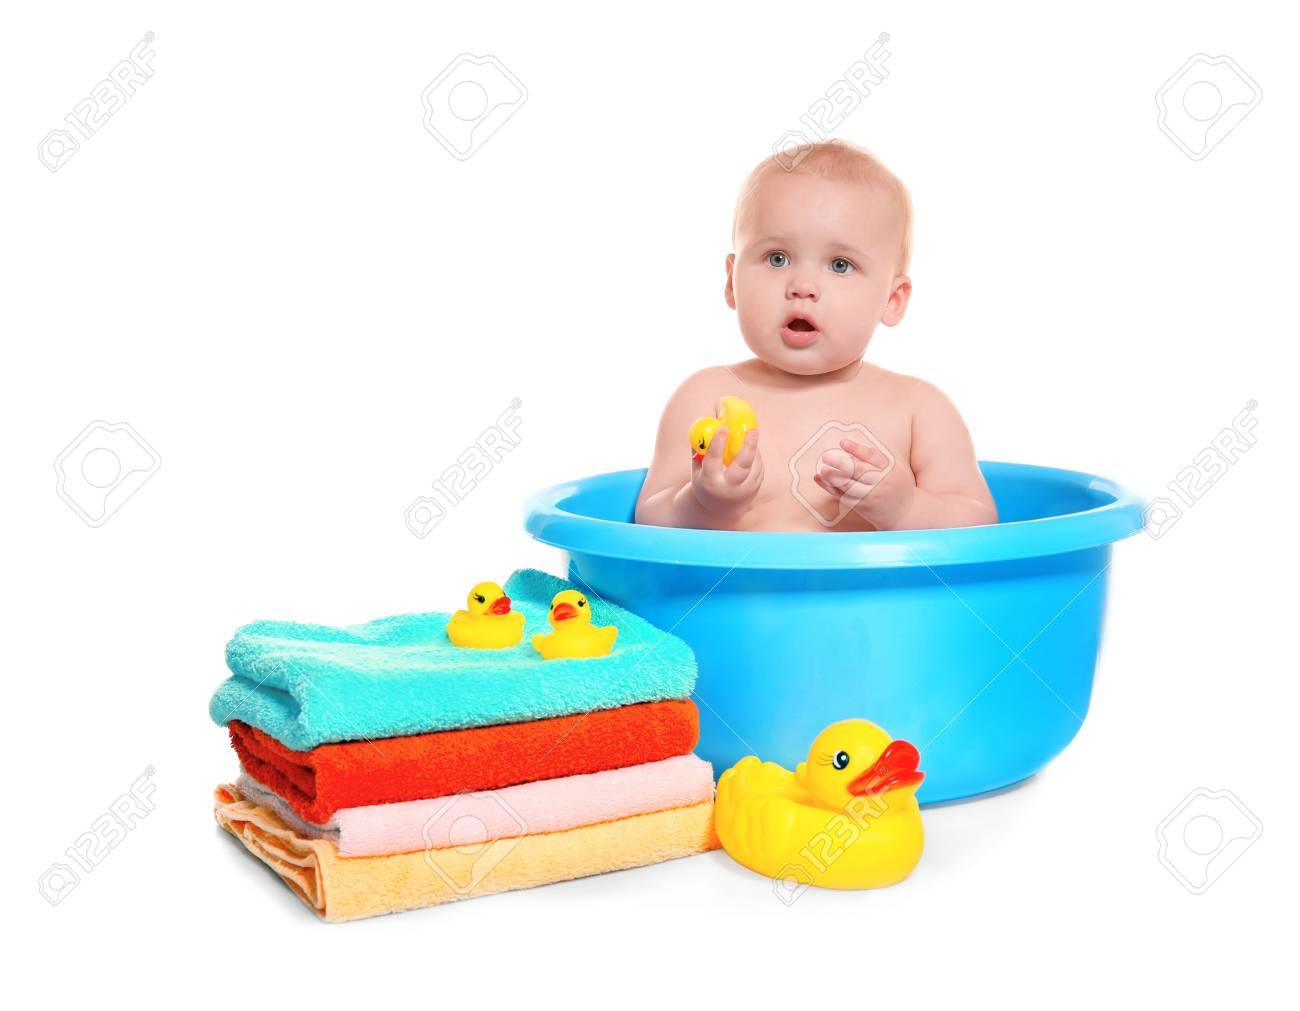 Cute Baby Washing In Bath Basin On White Background Stock Photo ...